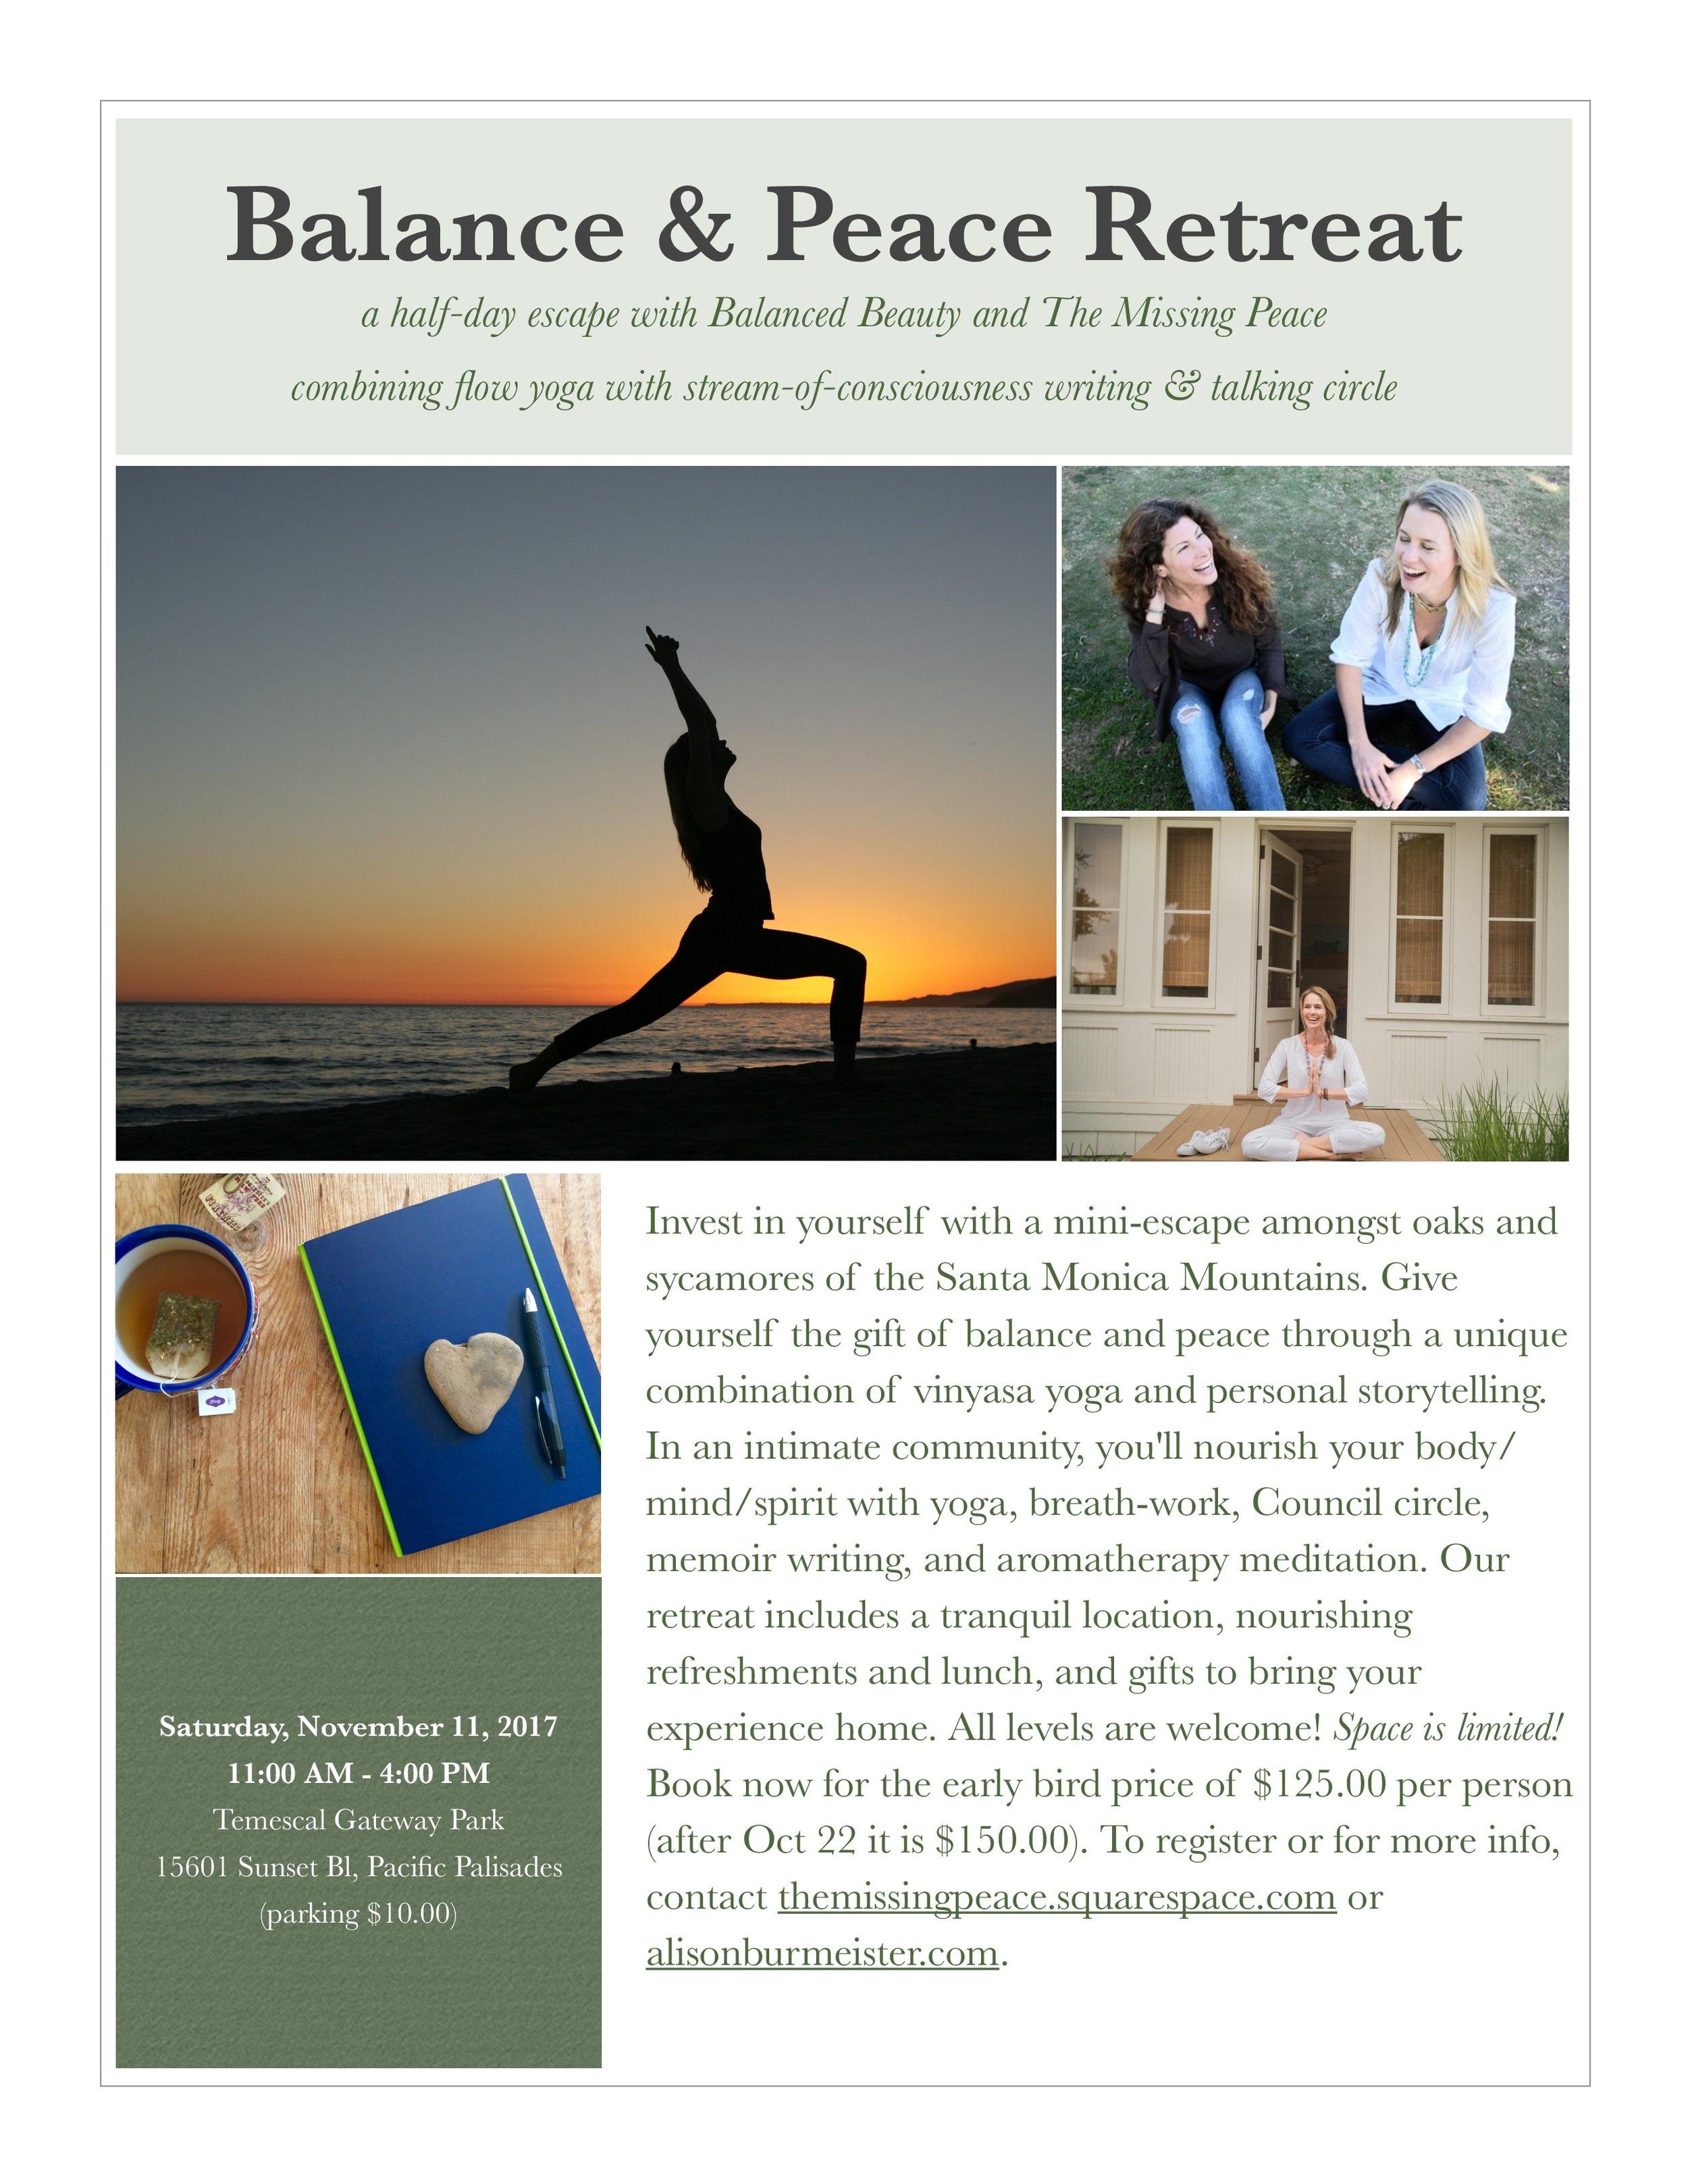 Balance & Peace Retreat-page-0.jpg